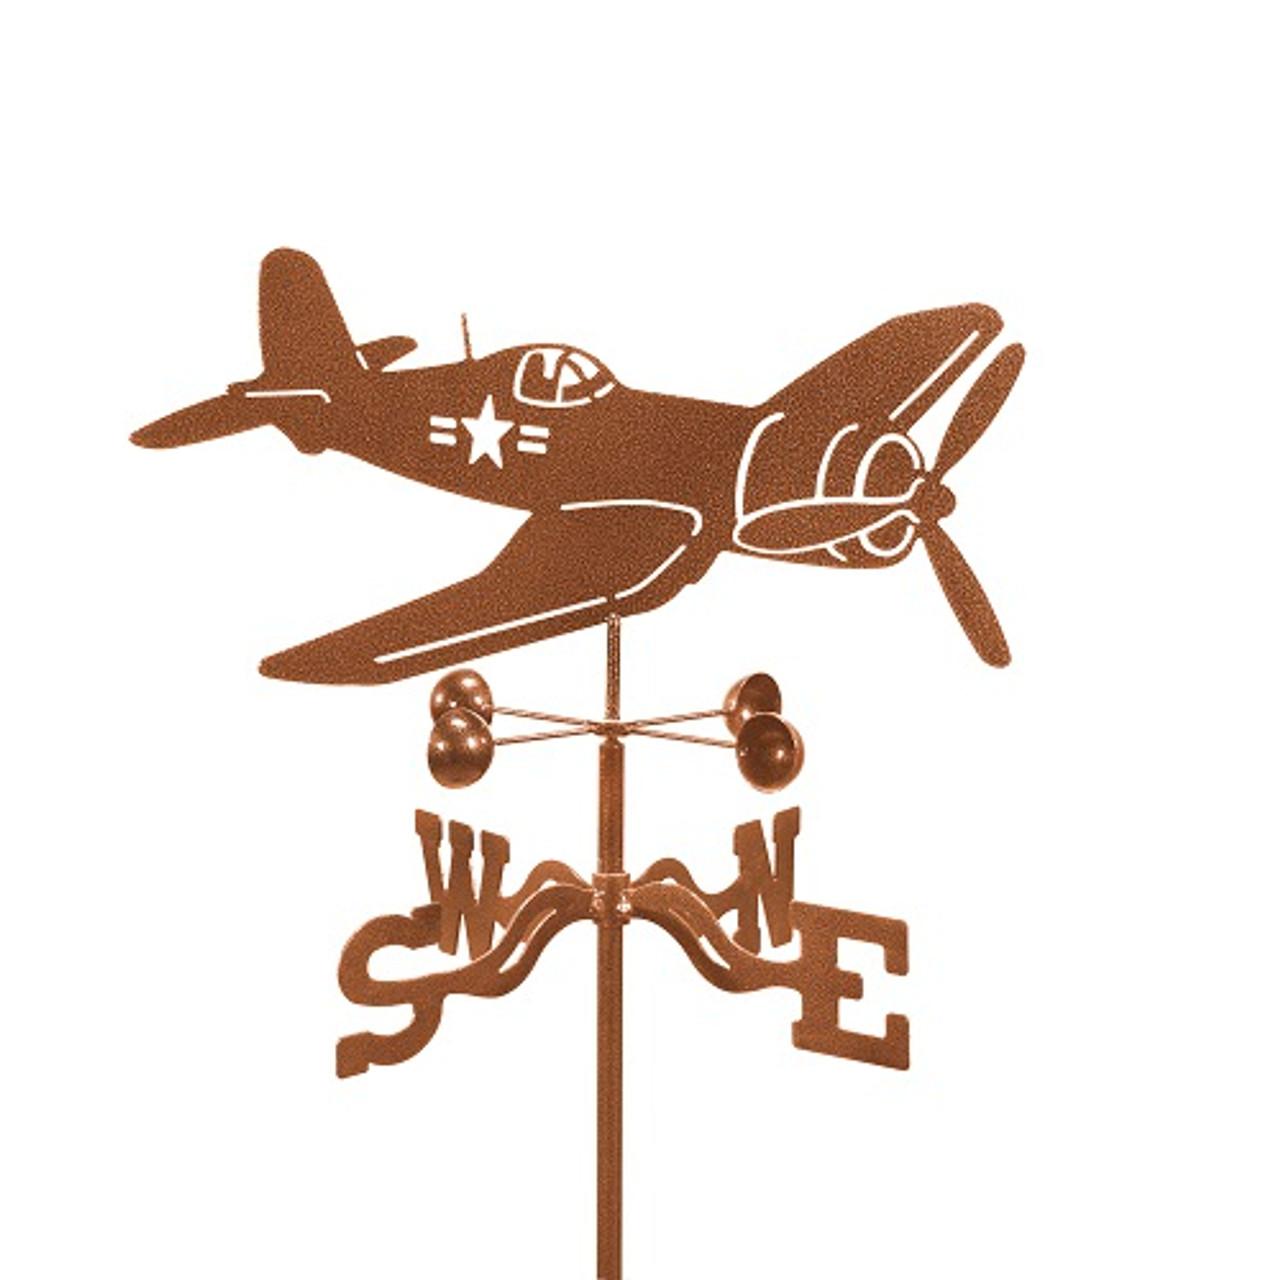 Airplane-Corsair Weathervane With Mount